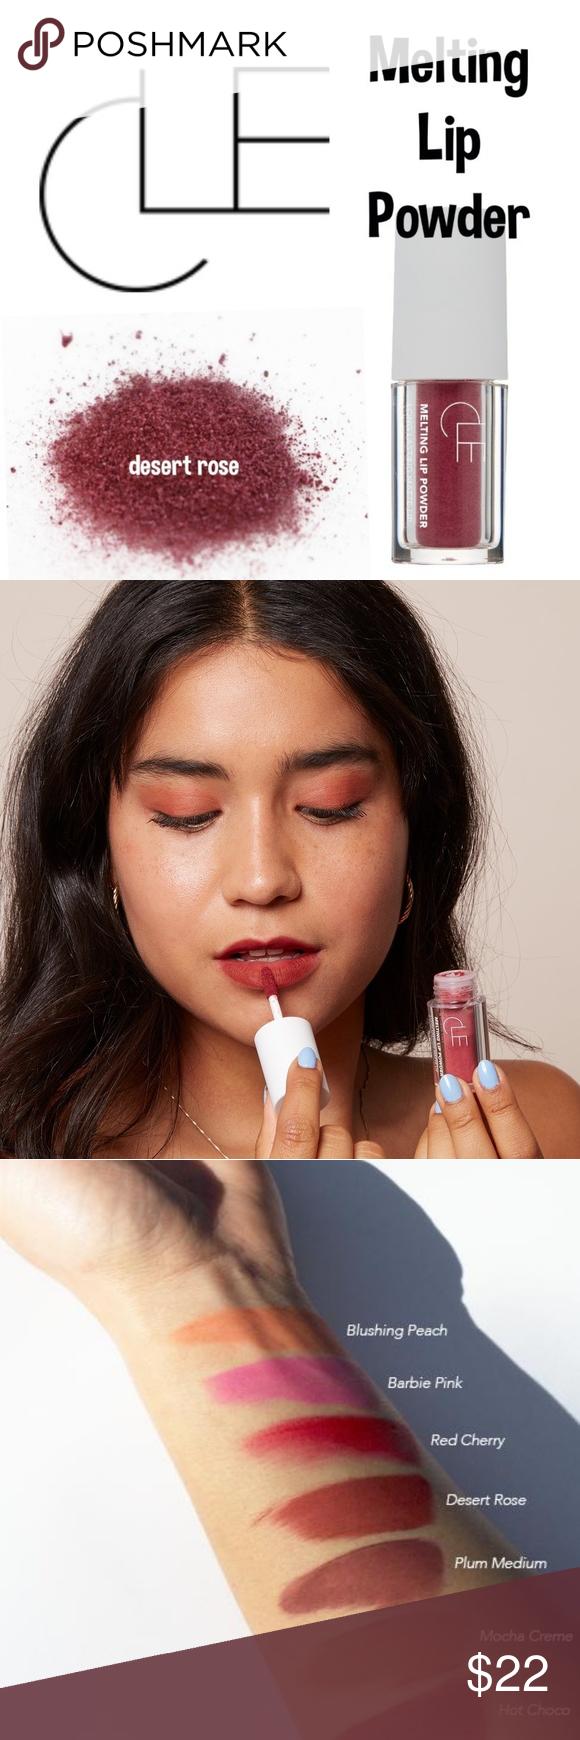 Cle Melting Lip Powder Matte Cheek Lip Tint Clē S Melting Lip Powder Is An Innovative Lip Product Transforming Pigmented Powder Into A Lo Lip Tint Lips Tints